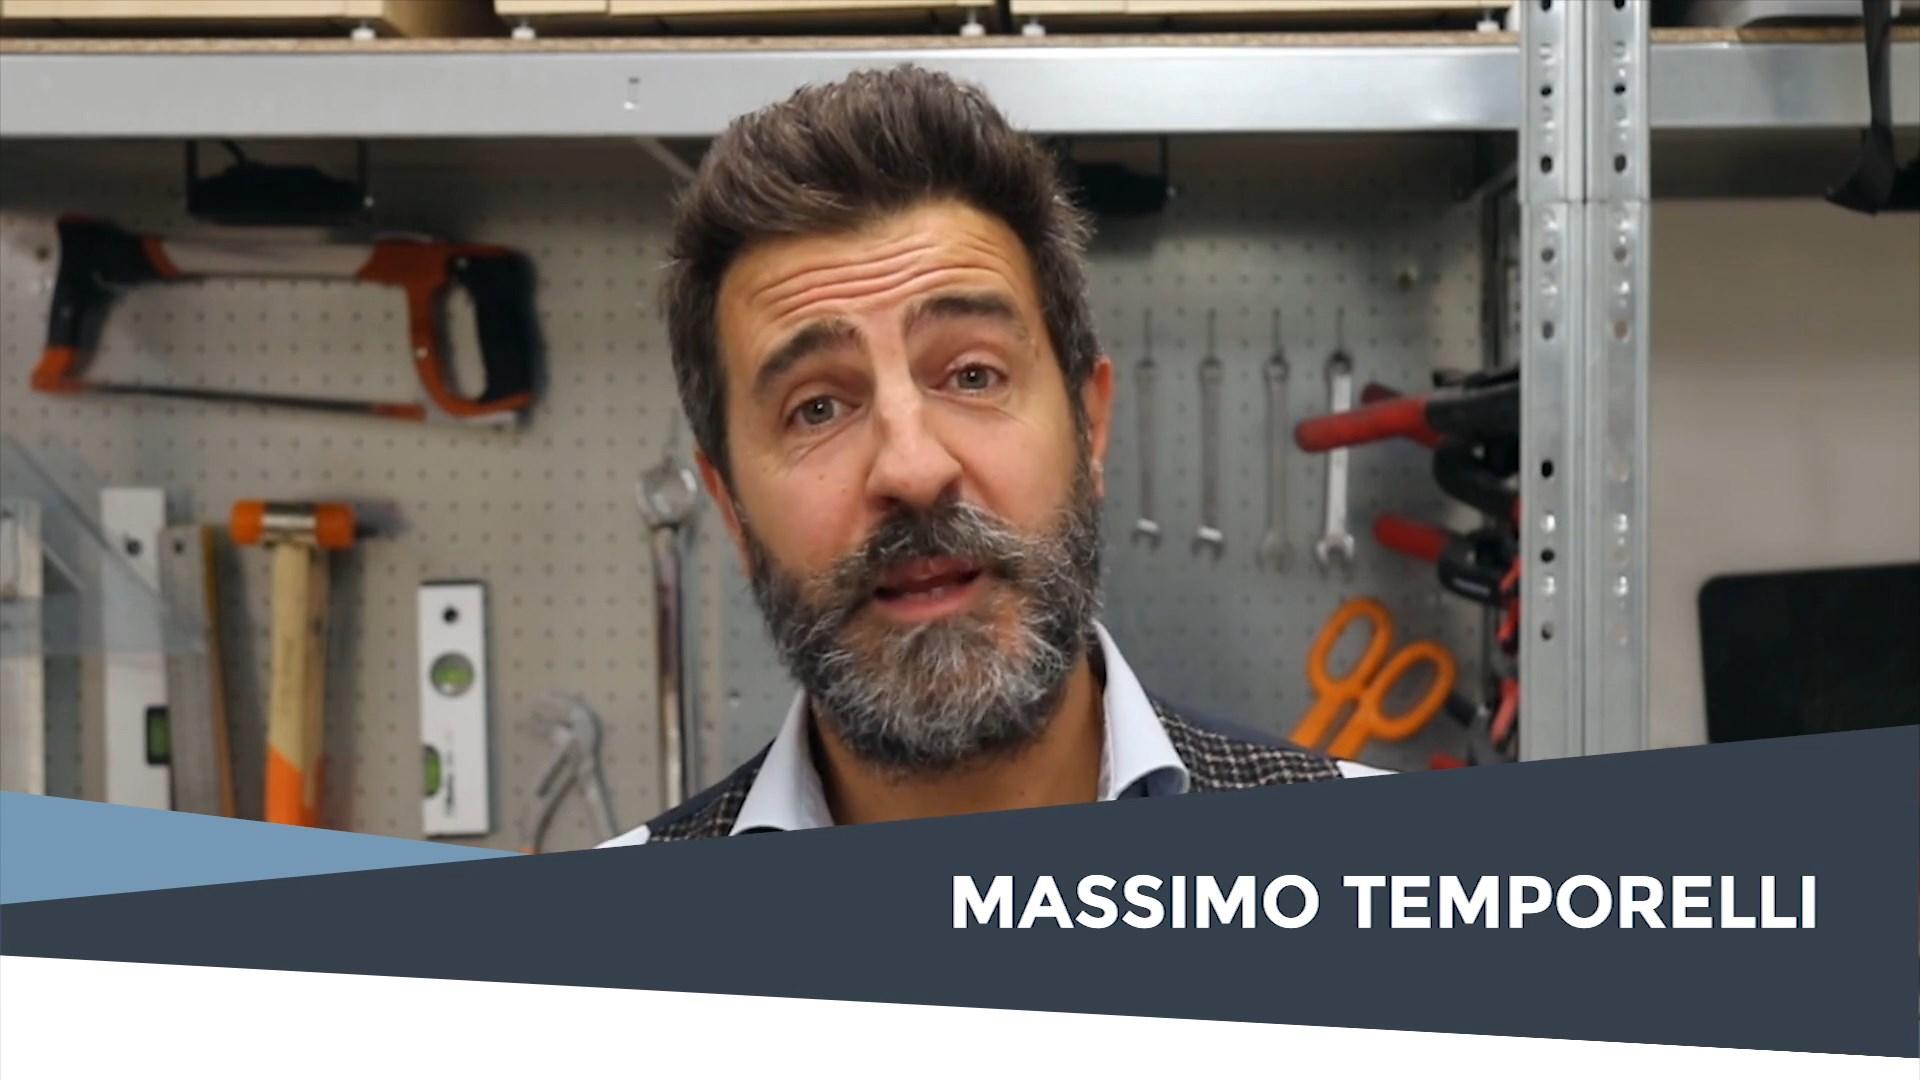 Intrevista a Massimo Temporelli